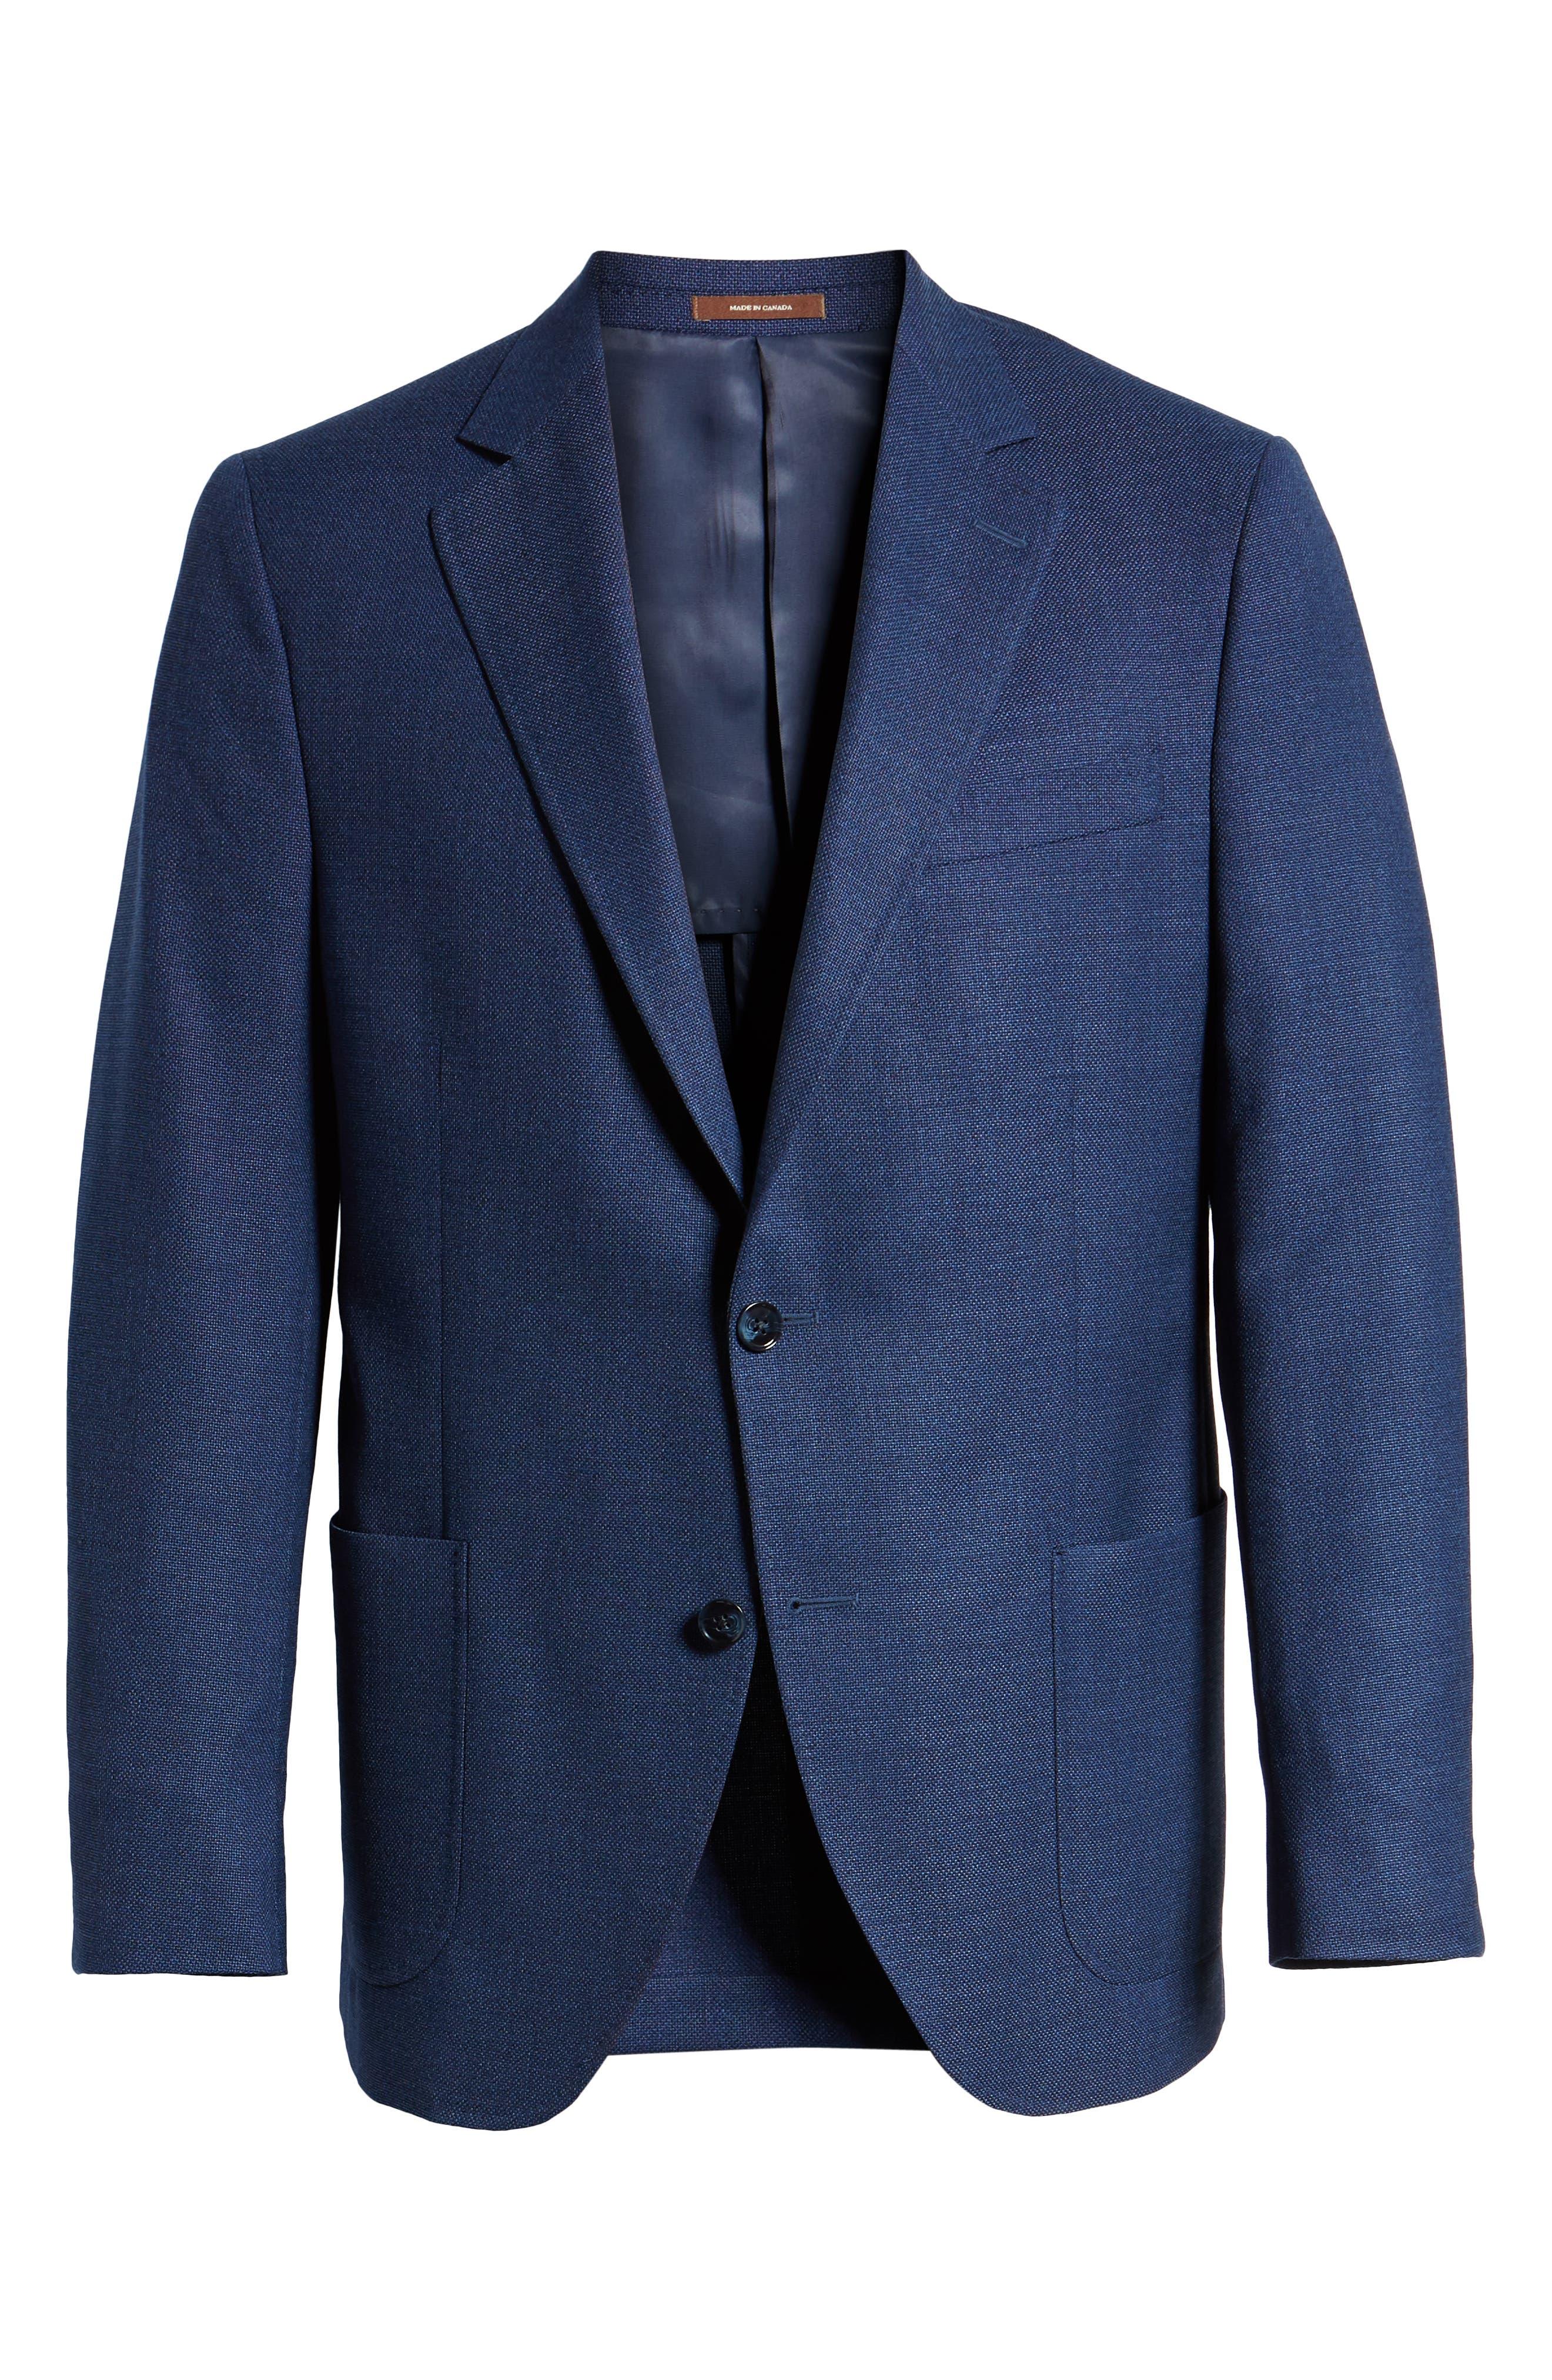 PETER MILLAR, Hyperlight Classic Fit Wool Sport Coat, Alternate thumbnail 5, color, 400